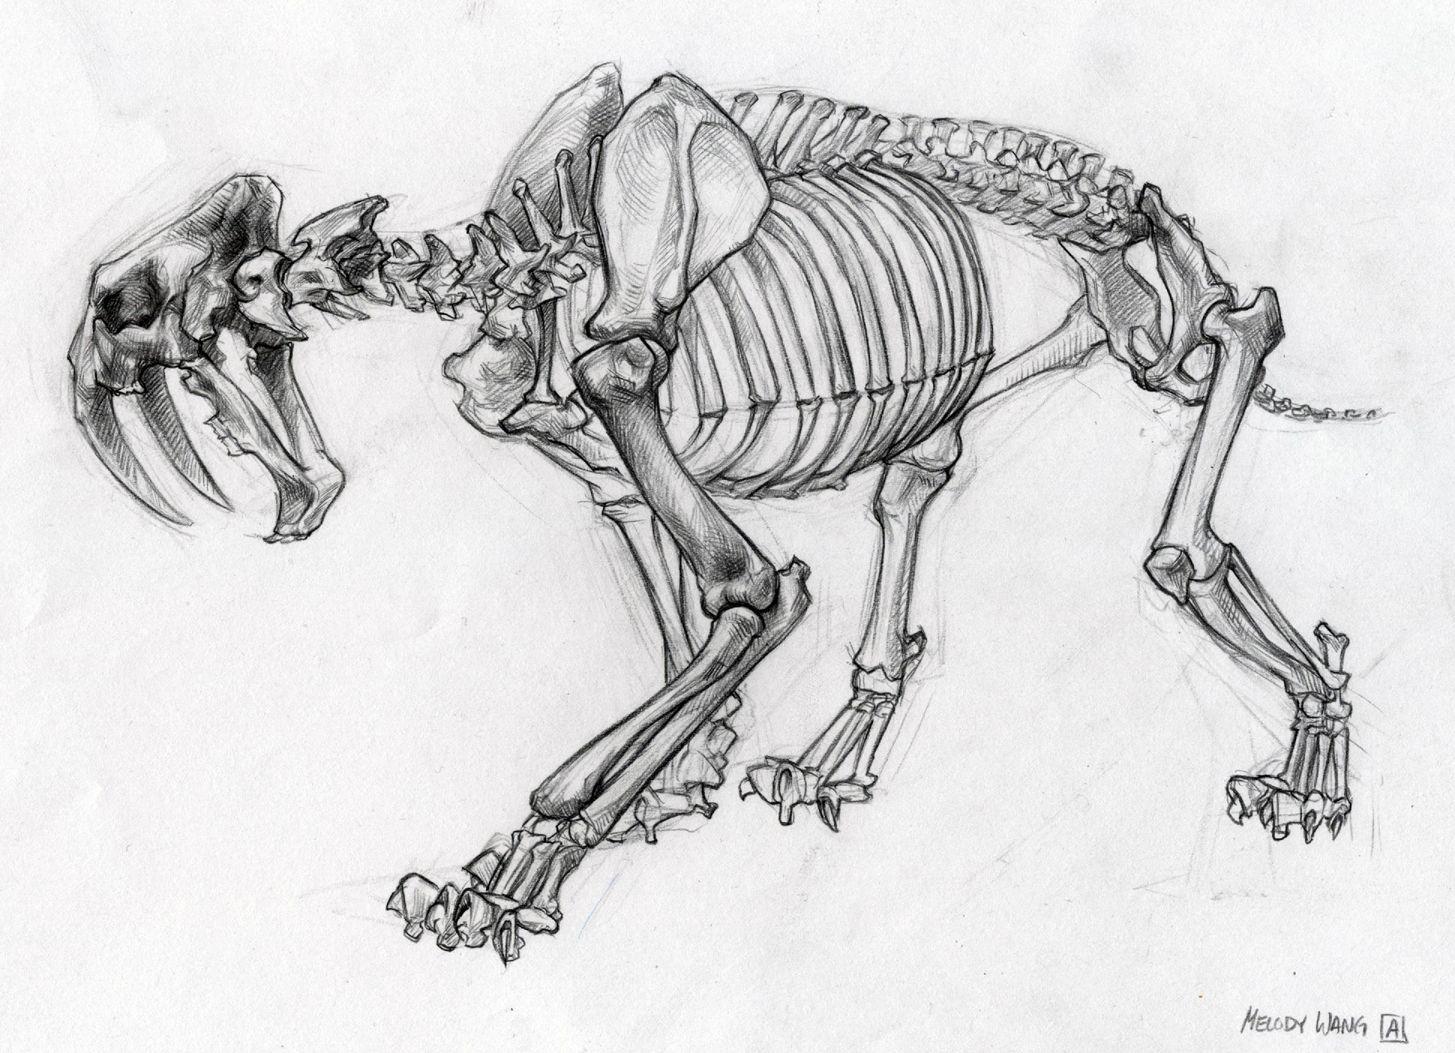 Explore Sabertooth Skeleton Tiger Skeleton And More